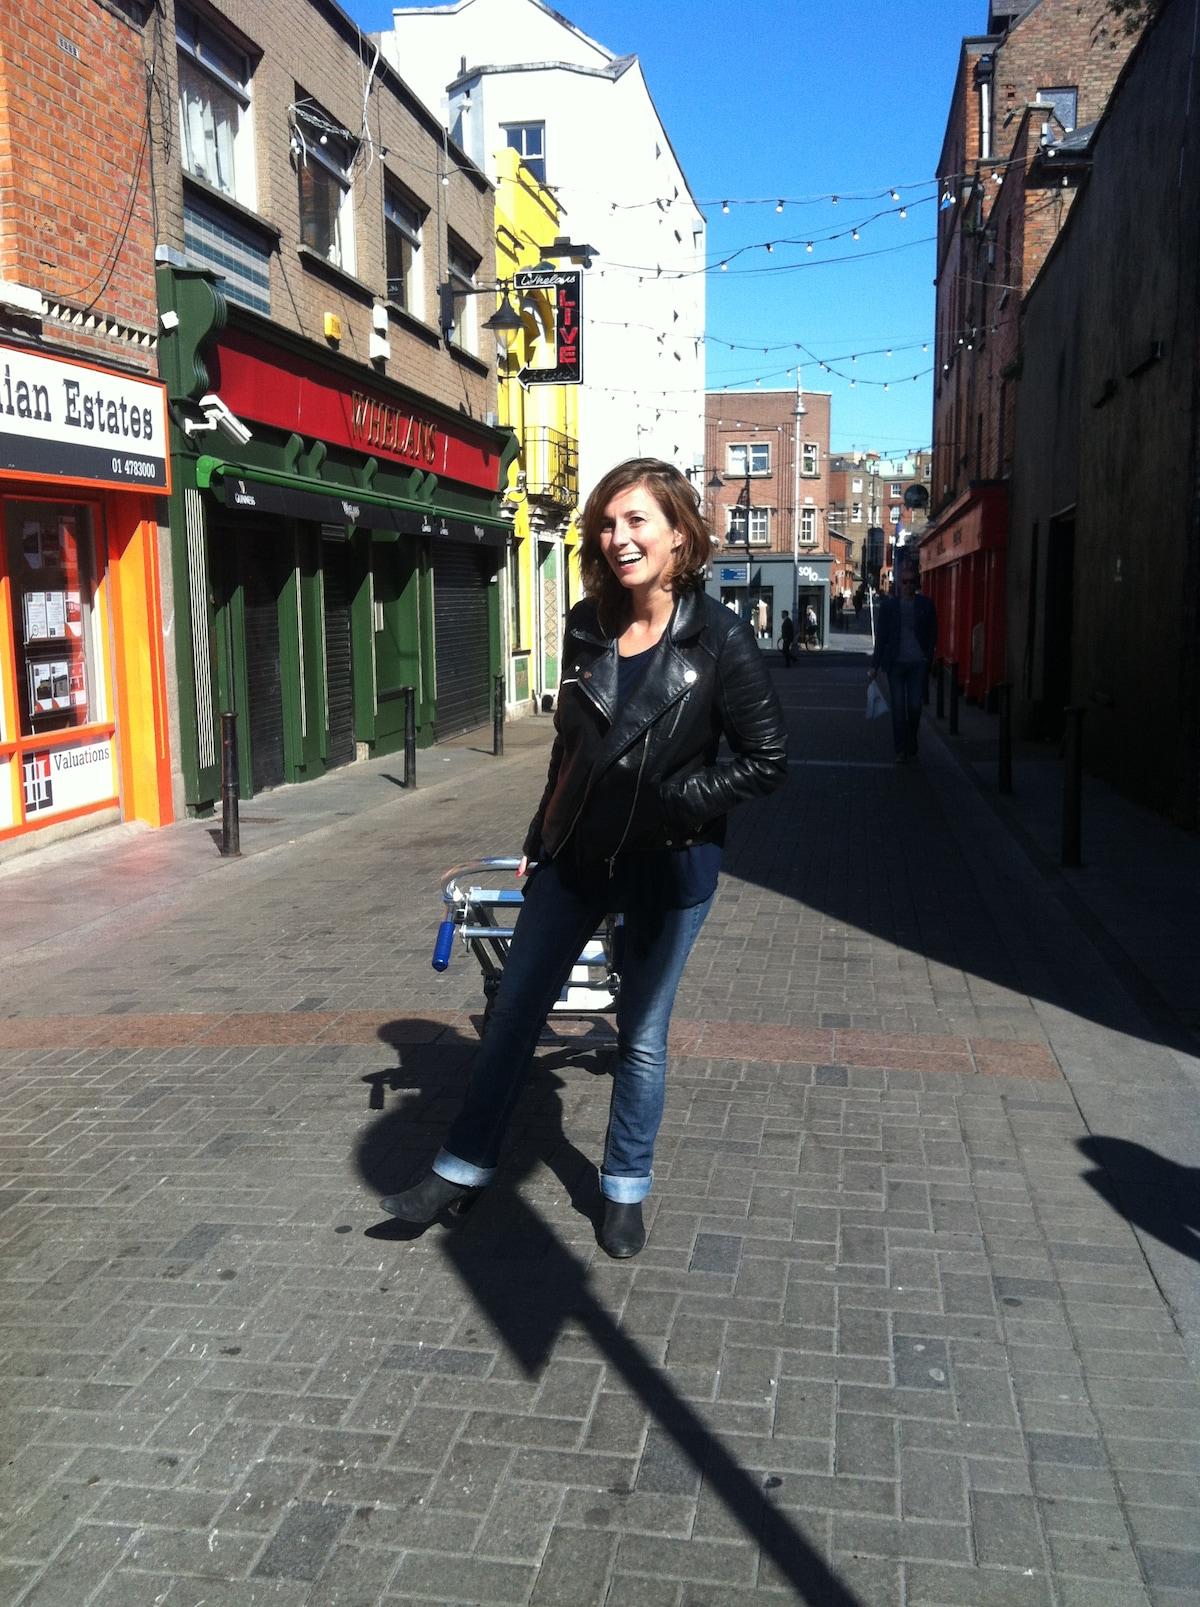 Hi everyone. I am an American living in Dublin and